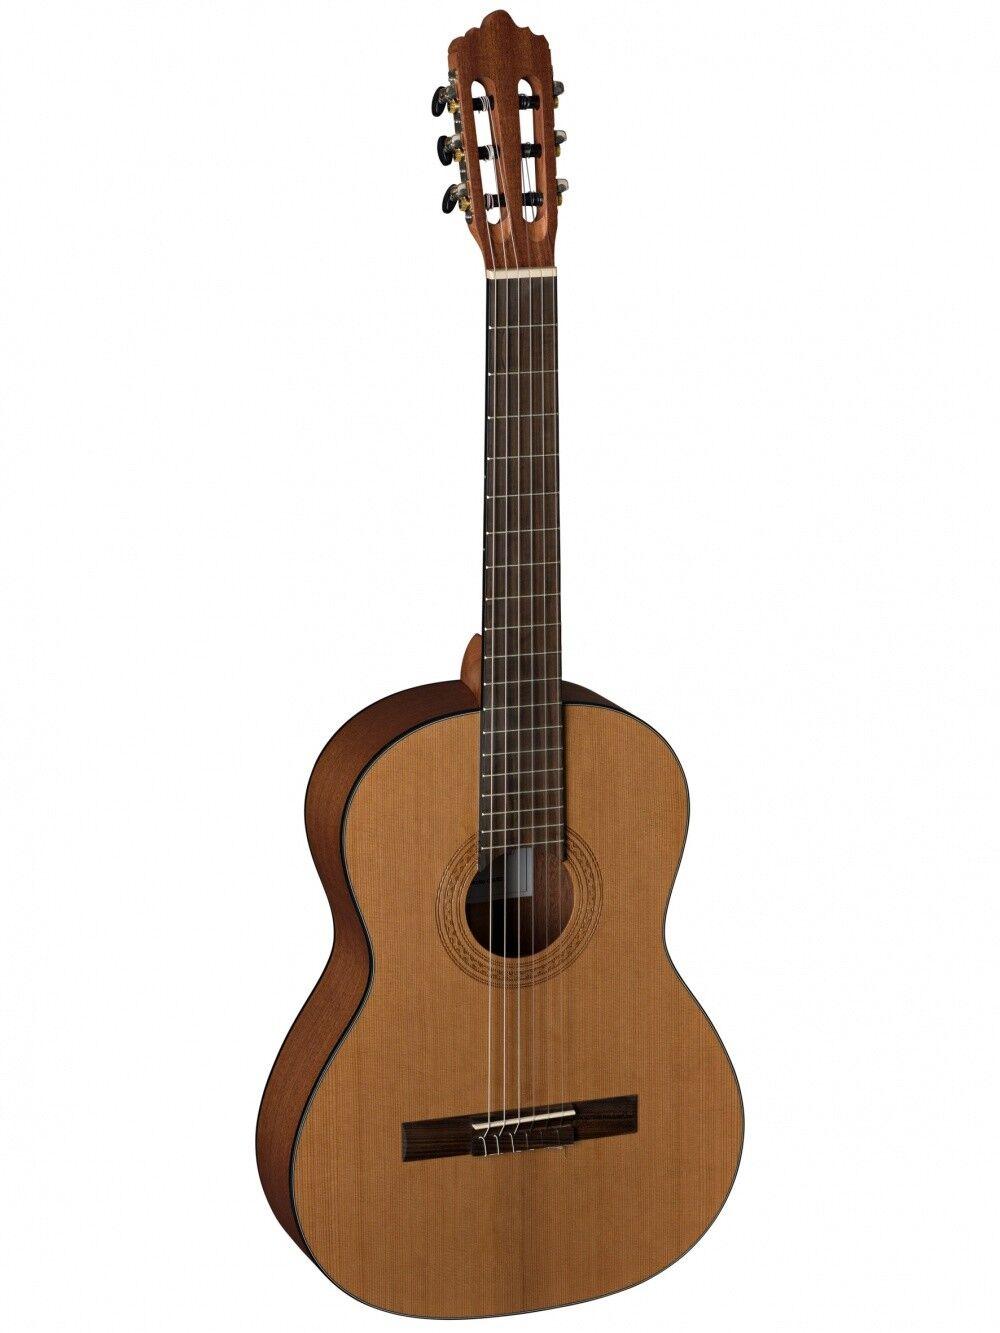 LA MANCHA Rubinito CM 4 4 Konzert Gitarre 4 4 Classic Guitar